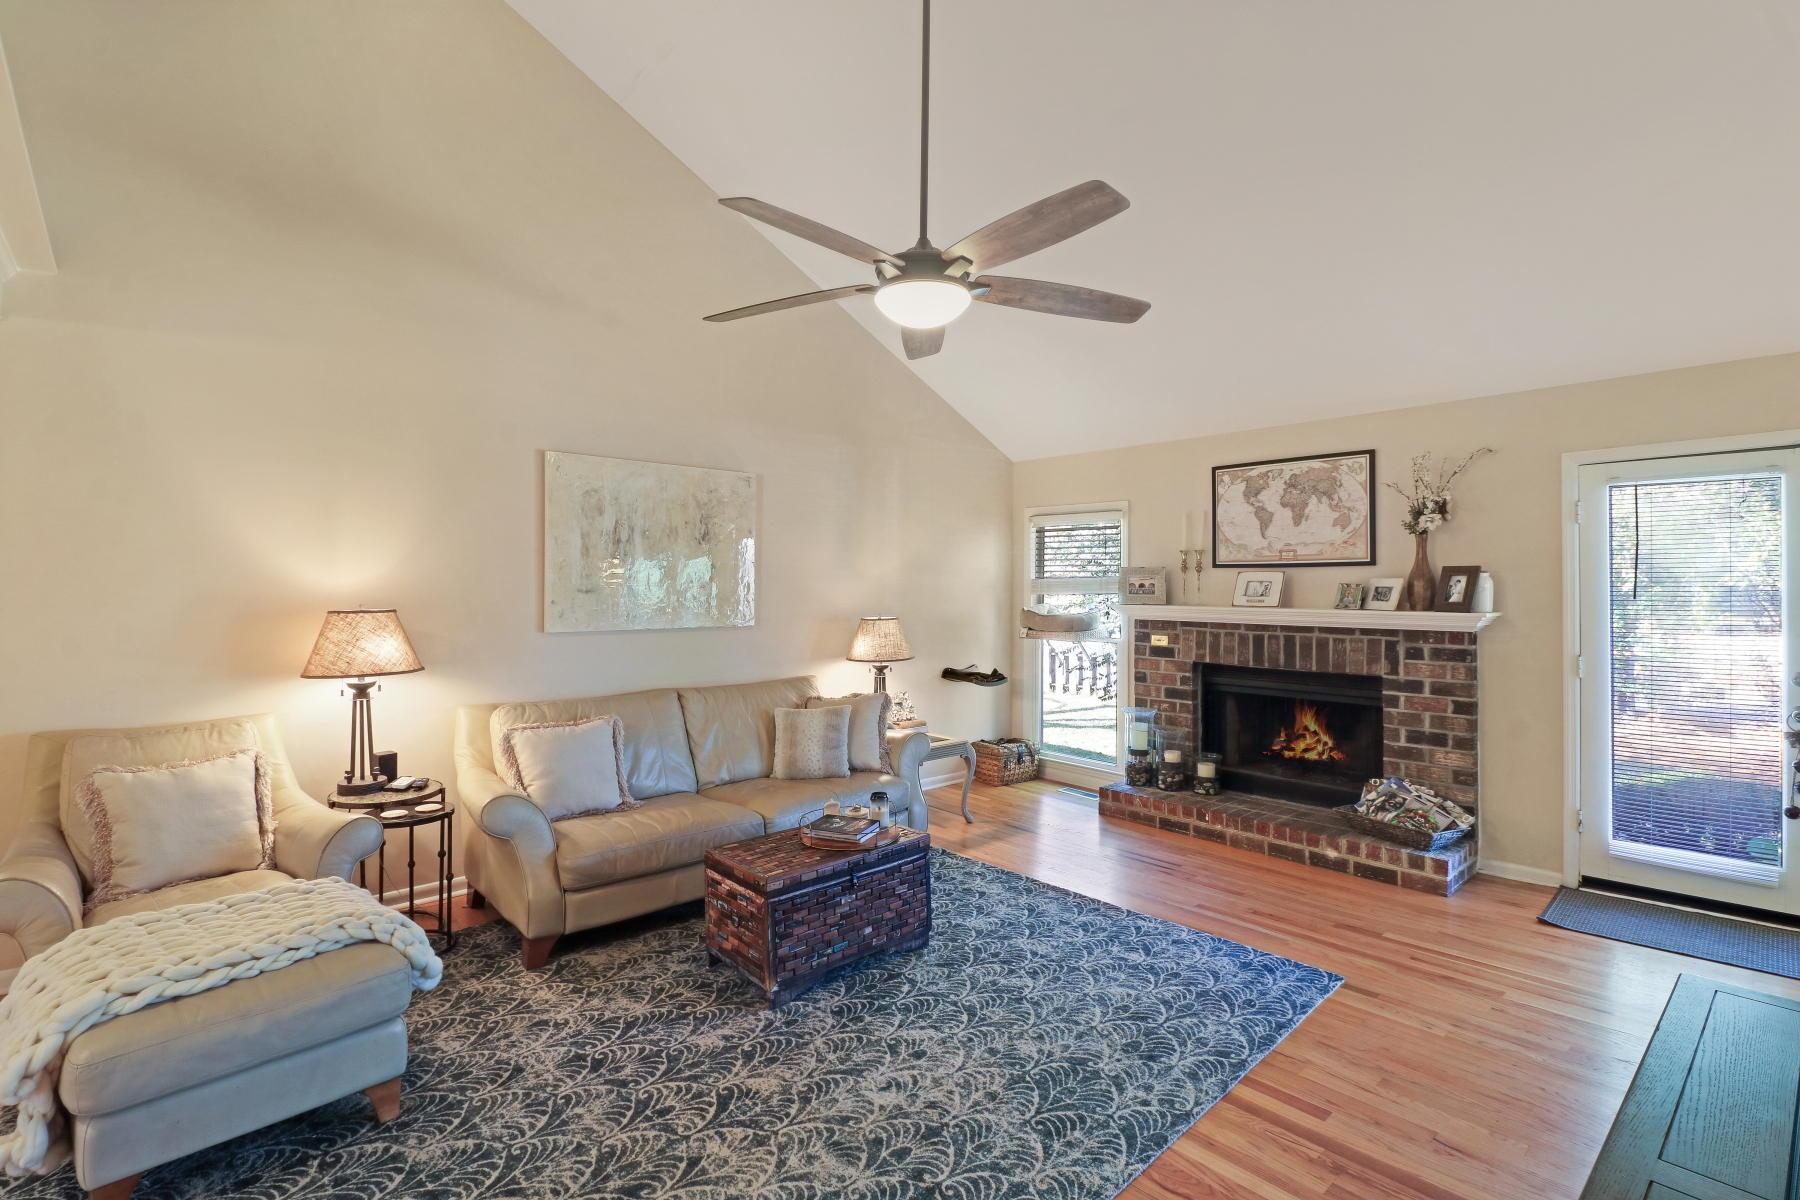 Harrison Acres Homes For Sale - 51 Markfield, Charleston, SC - 32